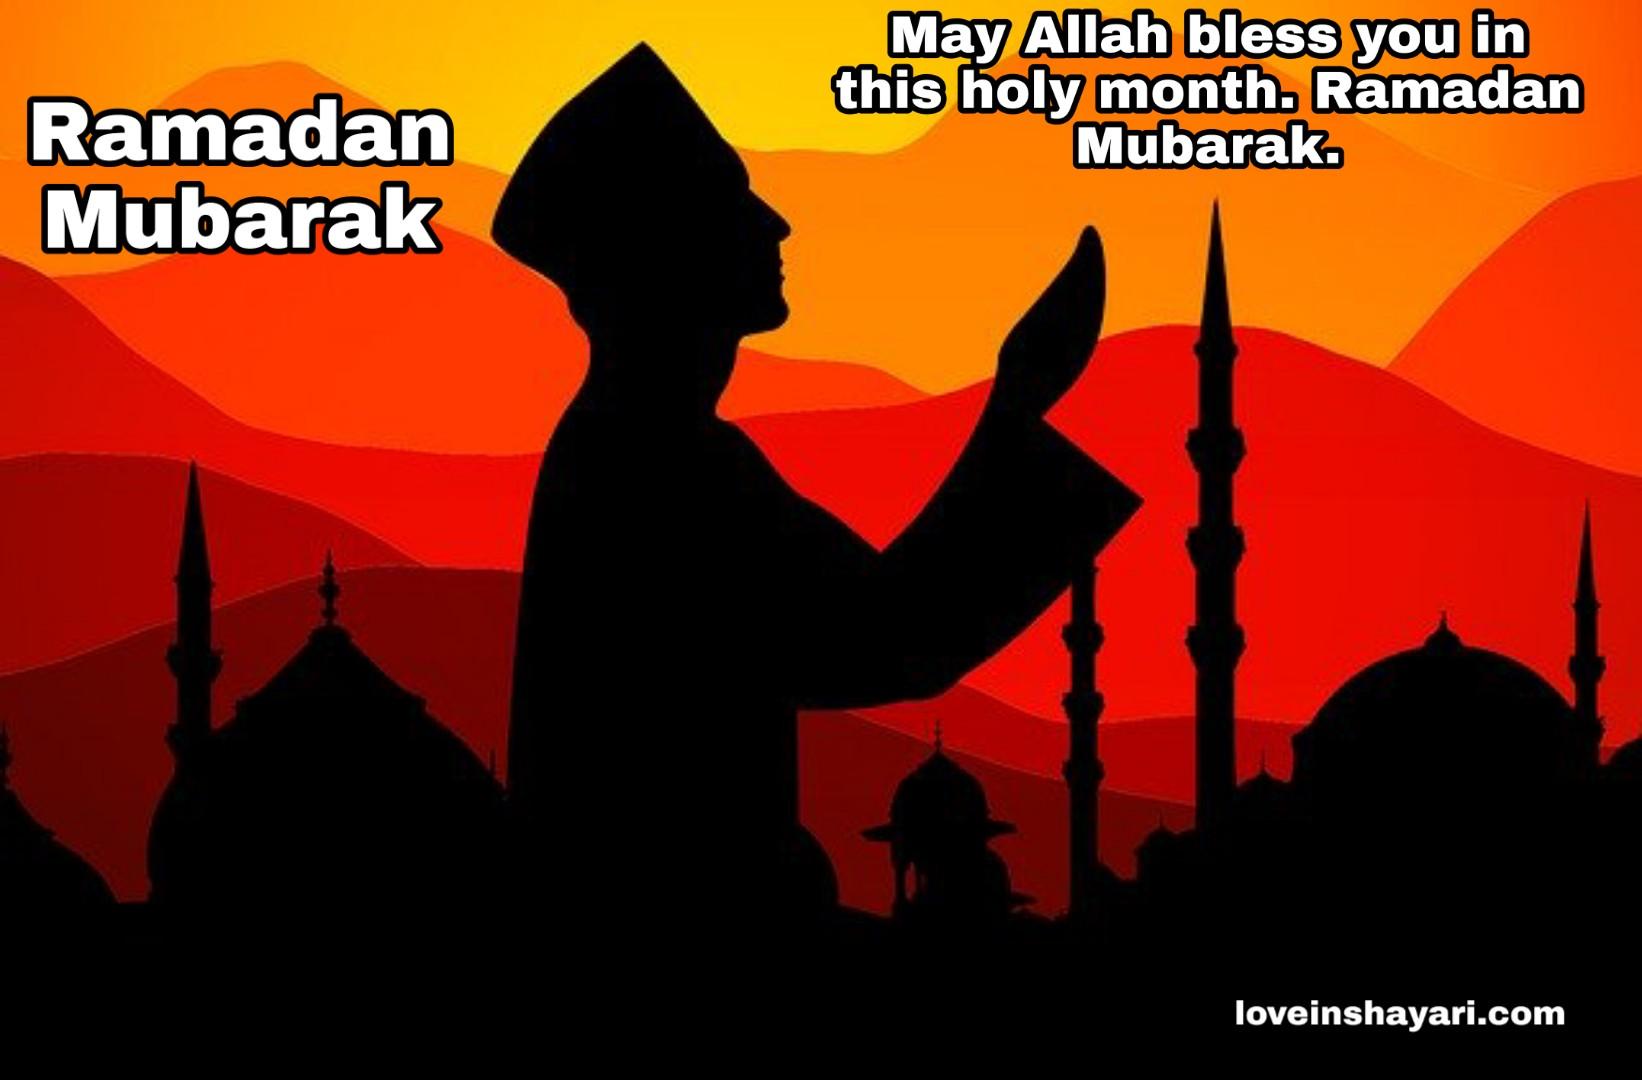 Photo of Ramadan images 2020 hd